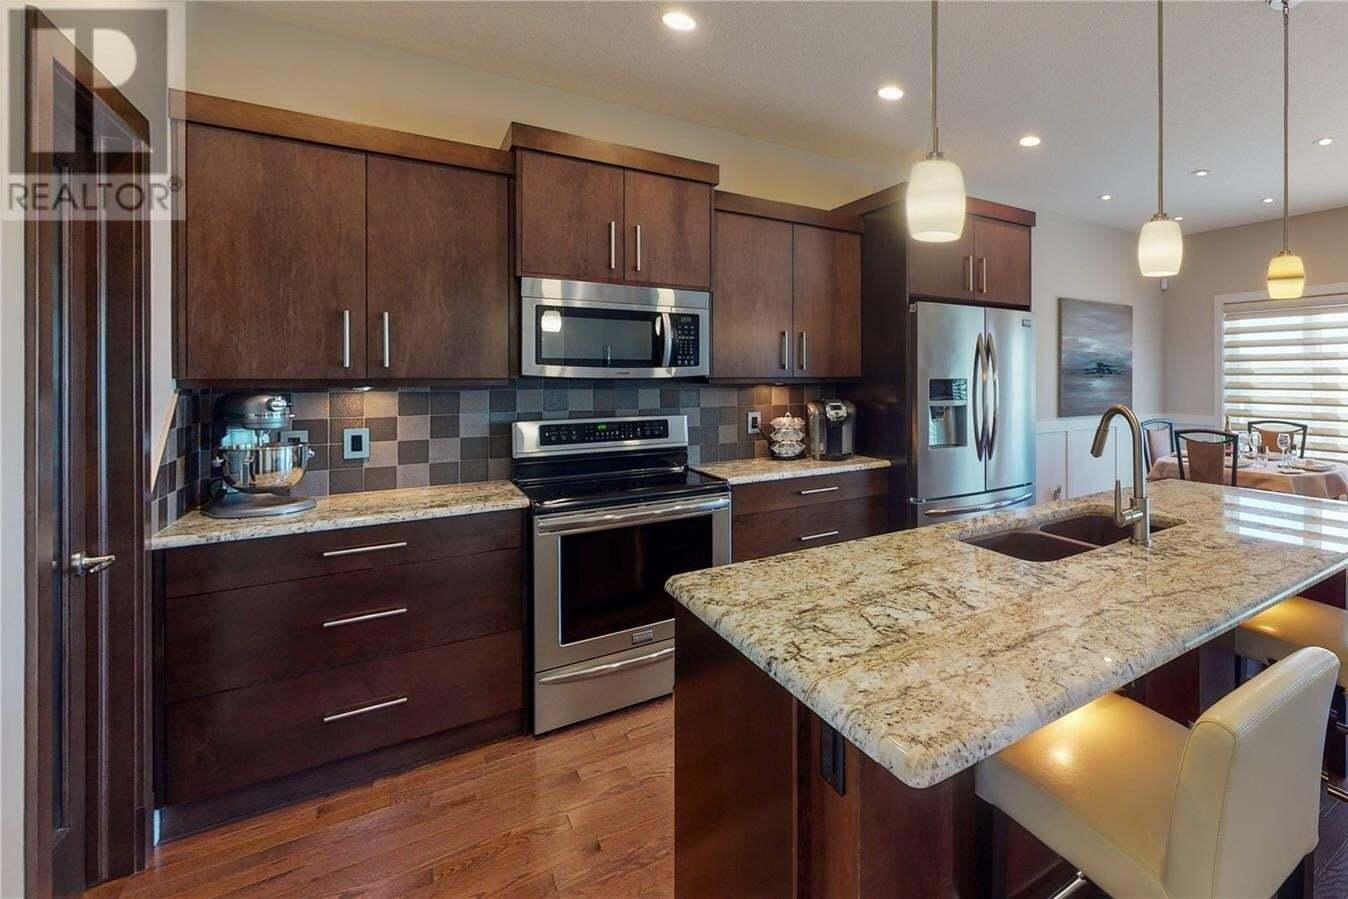 House for sale at 4401 Padwick Rd Regina Saskatchewan - MLS: SK810635